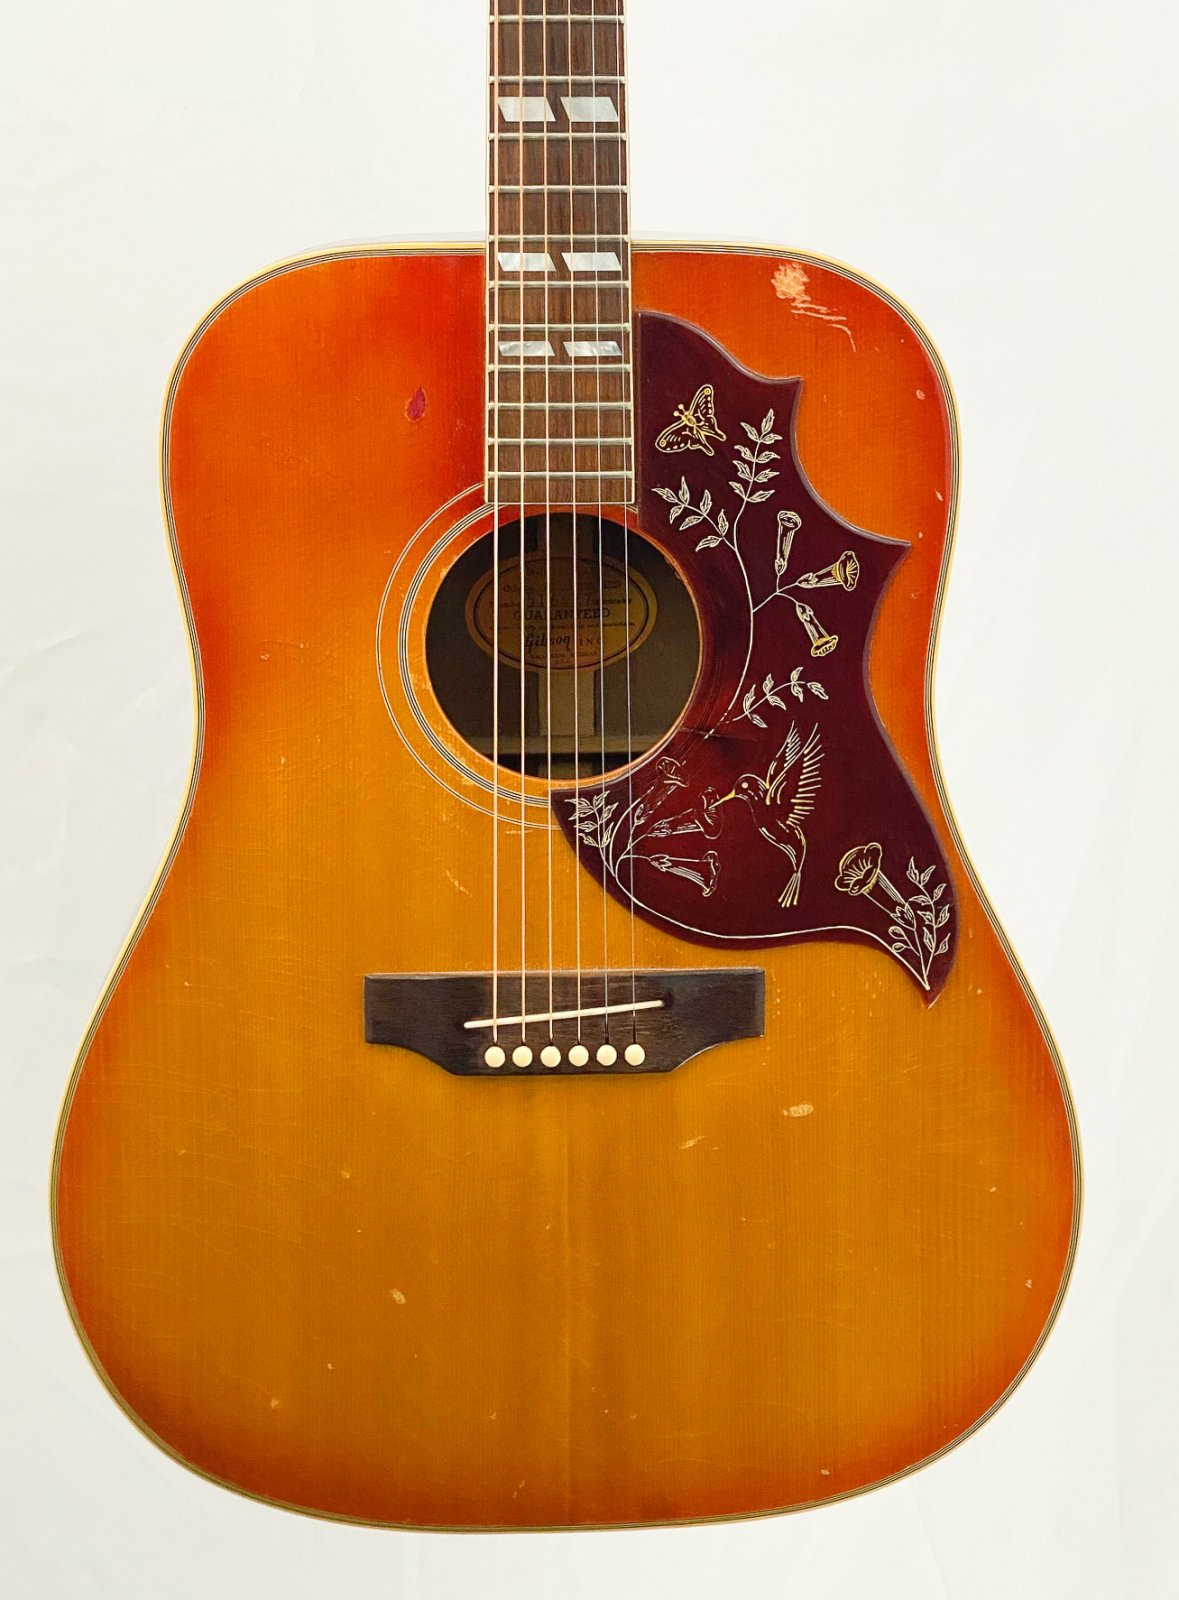 Vintage mid-60s Gibson Hummingbird - w/HSC